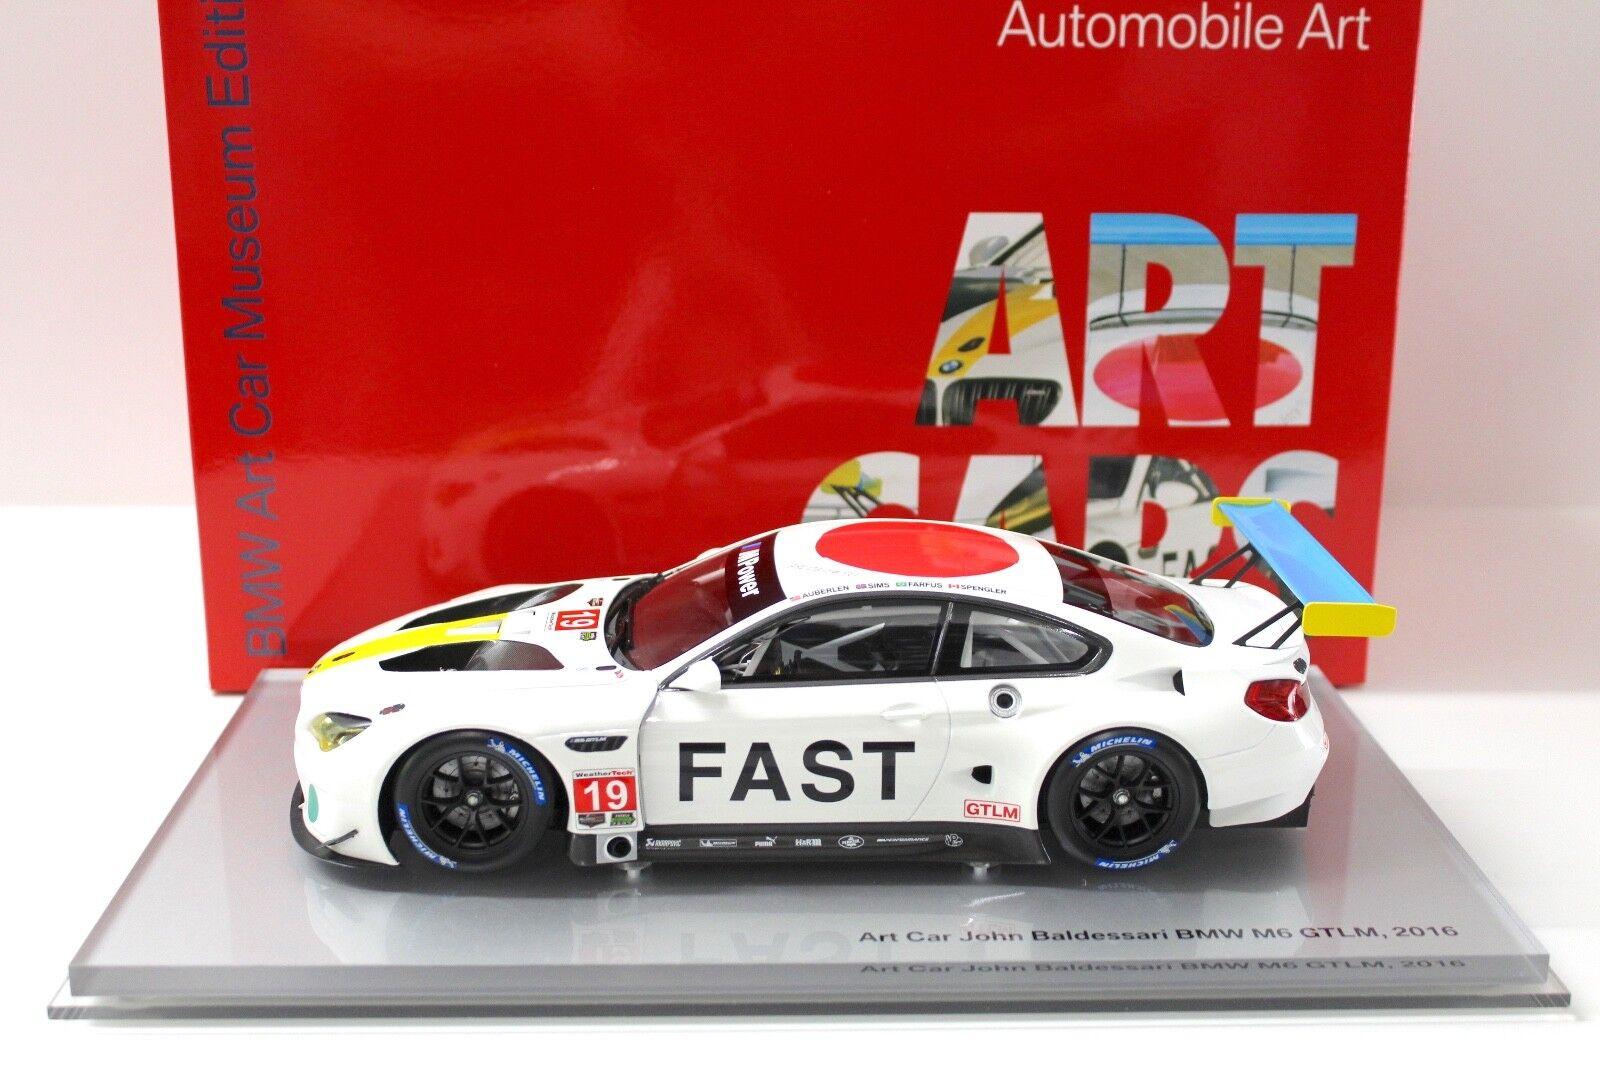 1 18 Kyosho BMW m6 GTLM 2016 Art Car John soon Sari NEW in Premium-modelcars